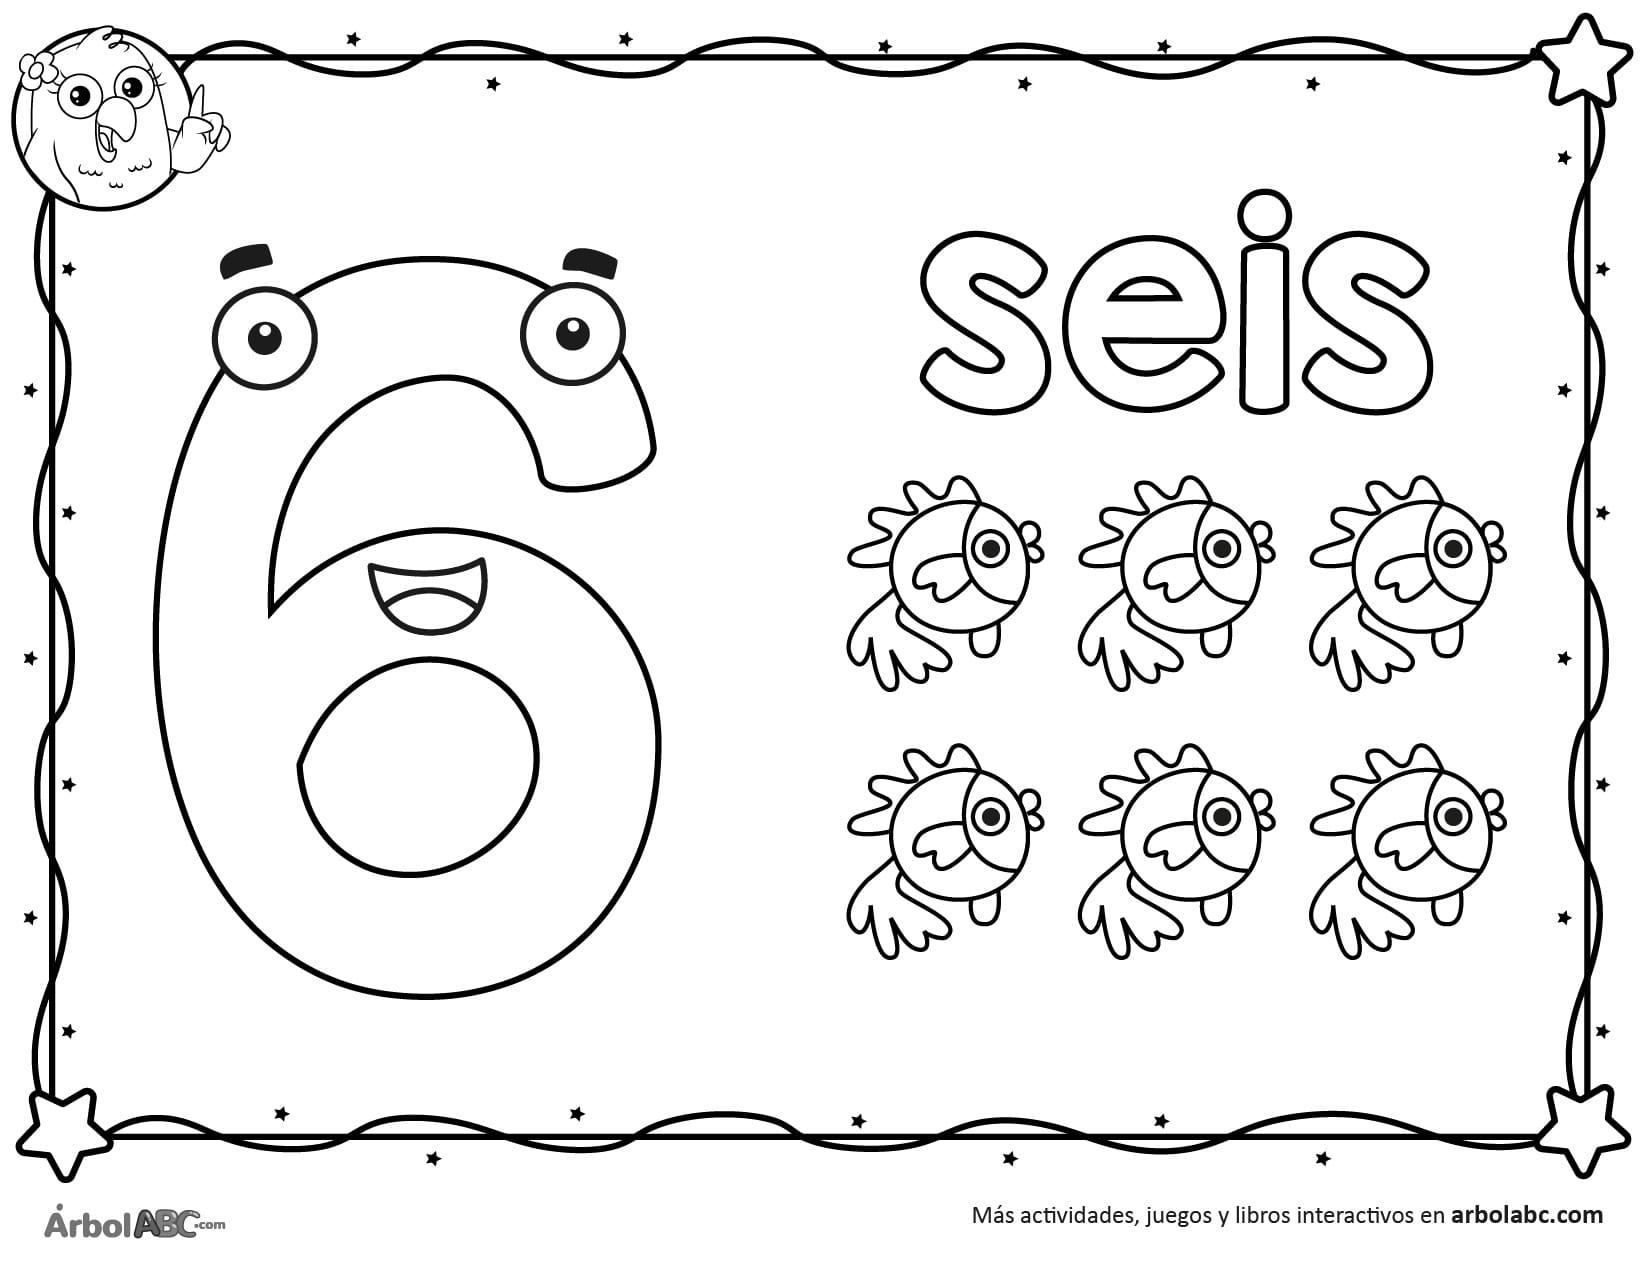 Seis Objetos Para Colorear Numero 6 Dibujos Para Colorearimprimir Dibujo Del Numero 6 Para